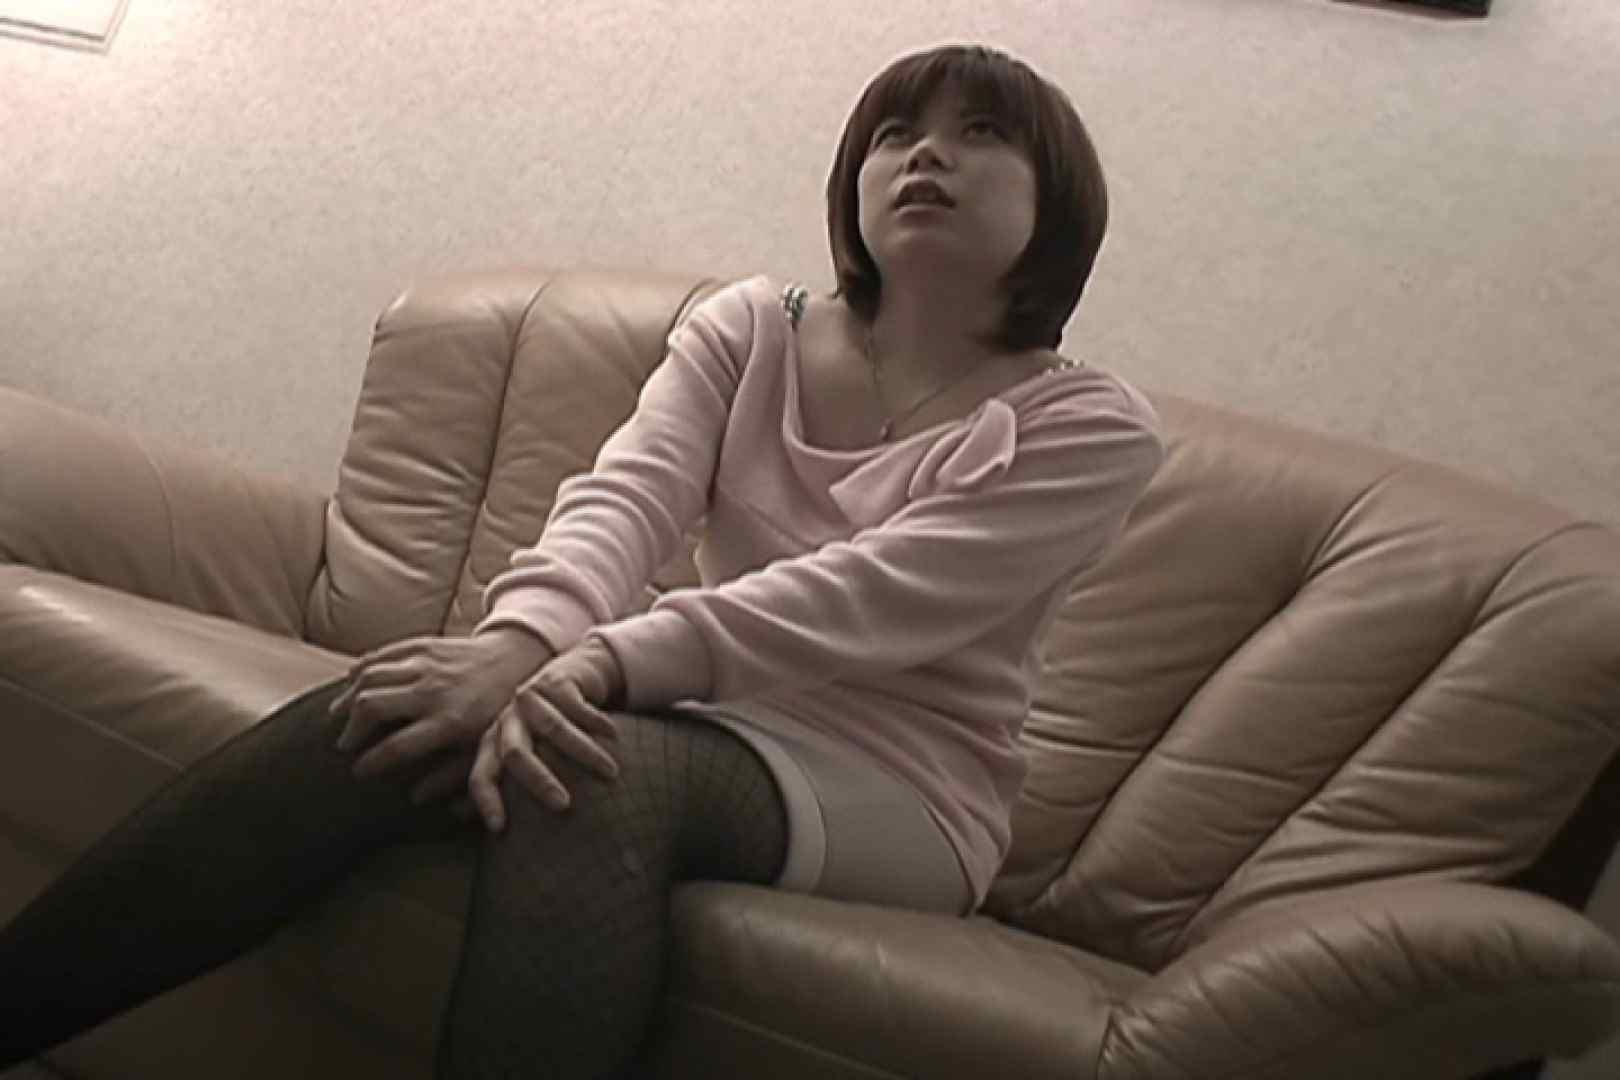 Hするために生まれてきたようなイキまくりの極エロ人妻~小池ゆり~ オナニー映像 オメコ動画キャプチャ 92枚 35